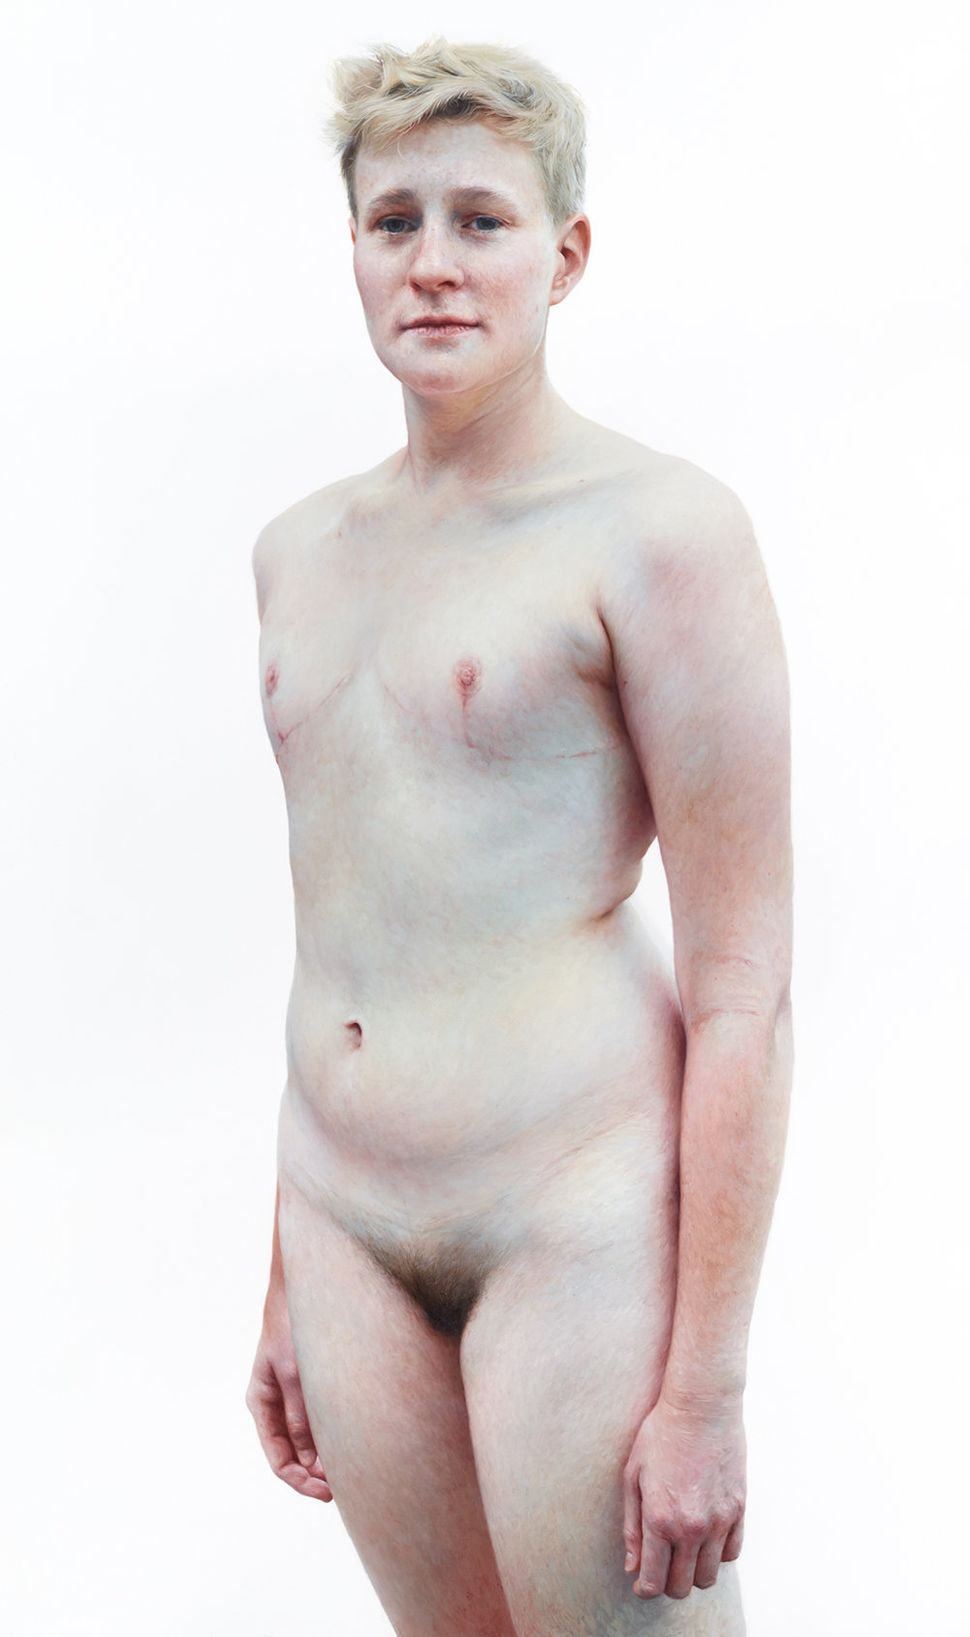 Unflinching Nude Portraits Explore The True Spectrum Of -5393